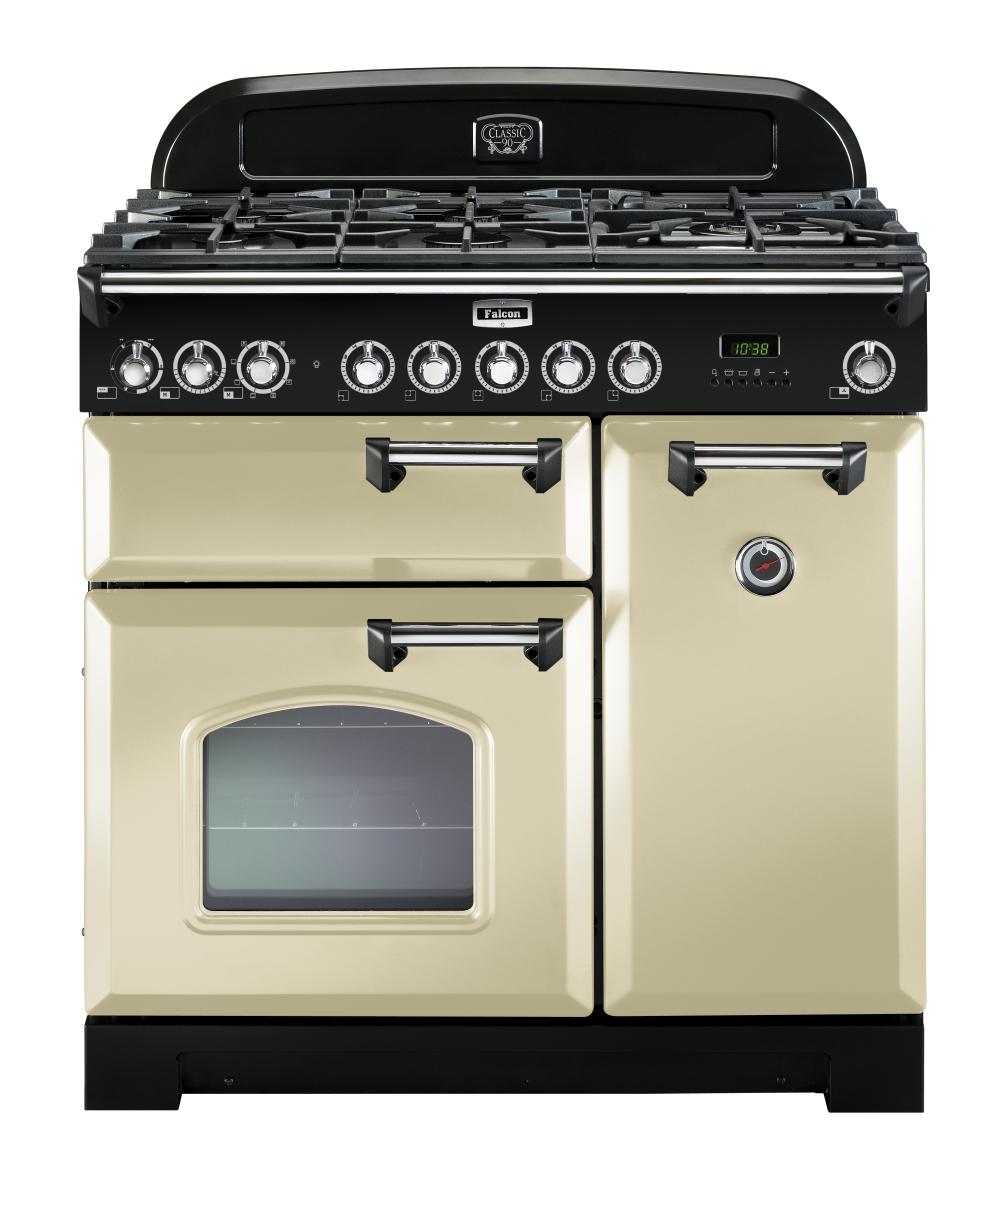 Falcon Classic Deluxe 90 Range Cooker, Gasherd mit Elektrobackofen, Cream, Energieeffizienzklasse A